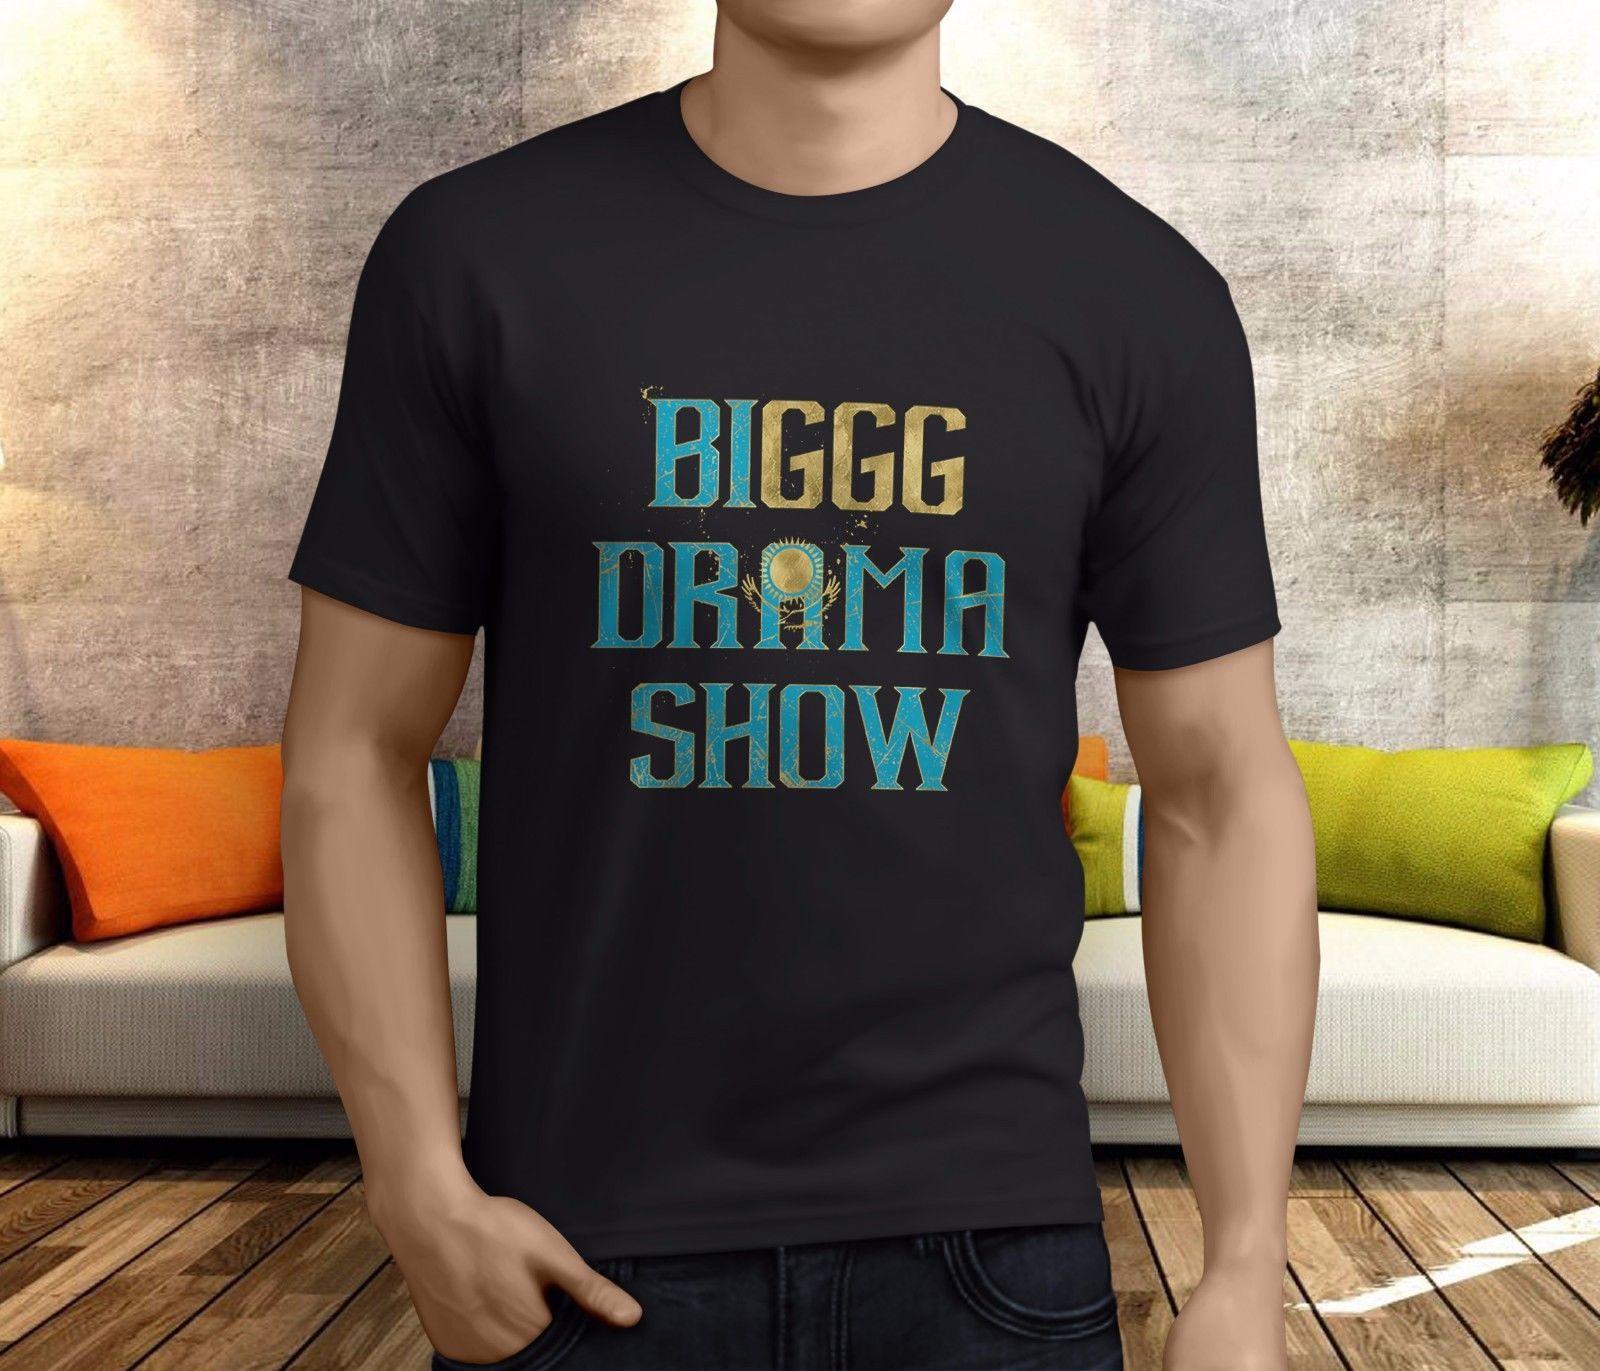 afec6b9a57b82c New Popular GGG BIGGG DRAMA SHOW Gennady Golovkin Men S Black T Shirt S 3XL  T Shirt Deals Humor Shirts From Goodluck064